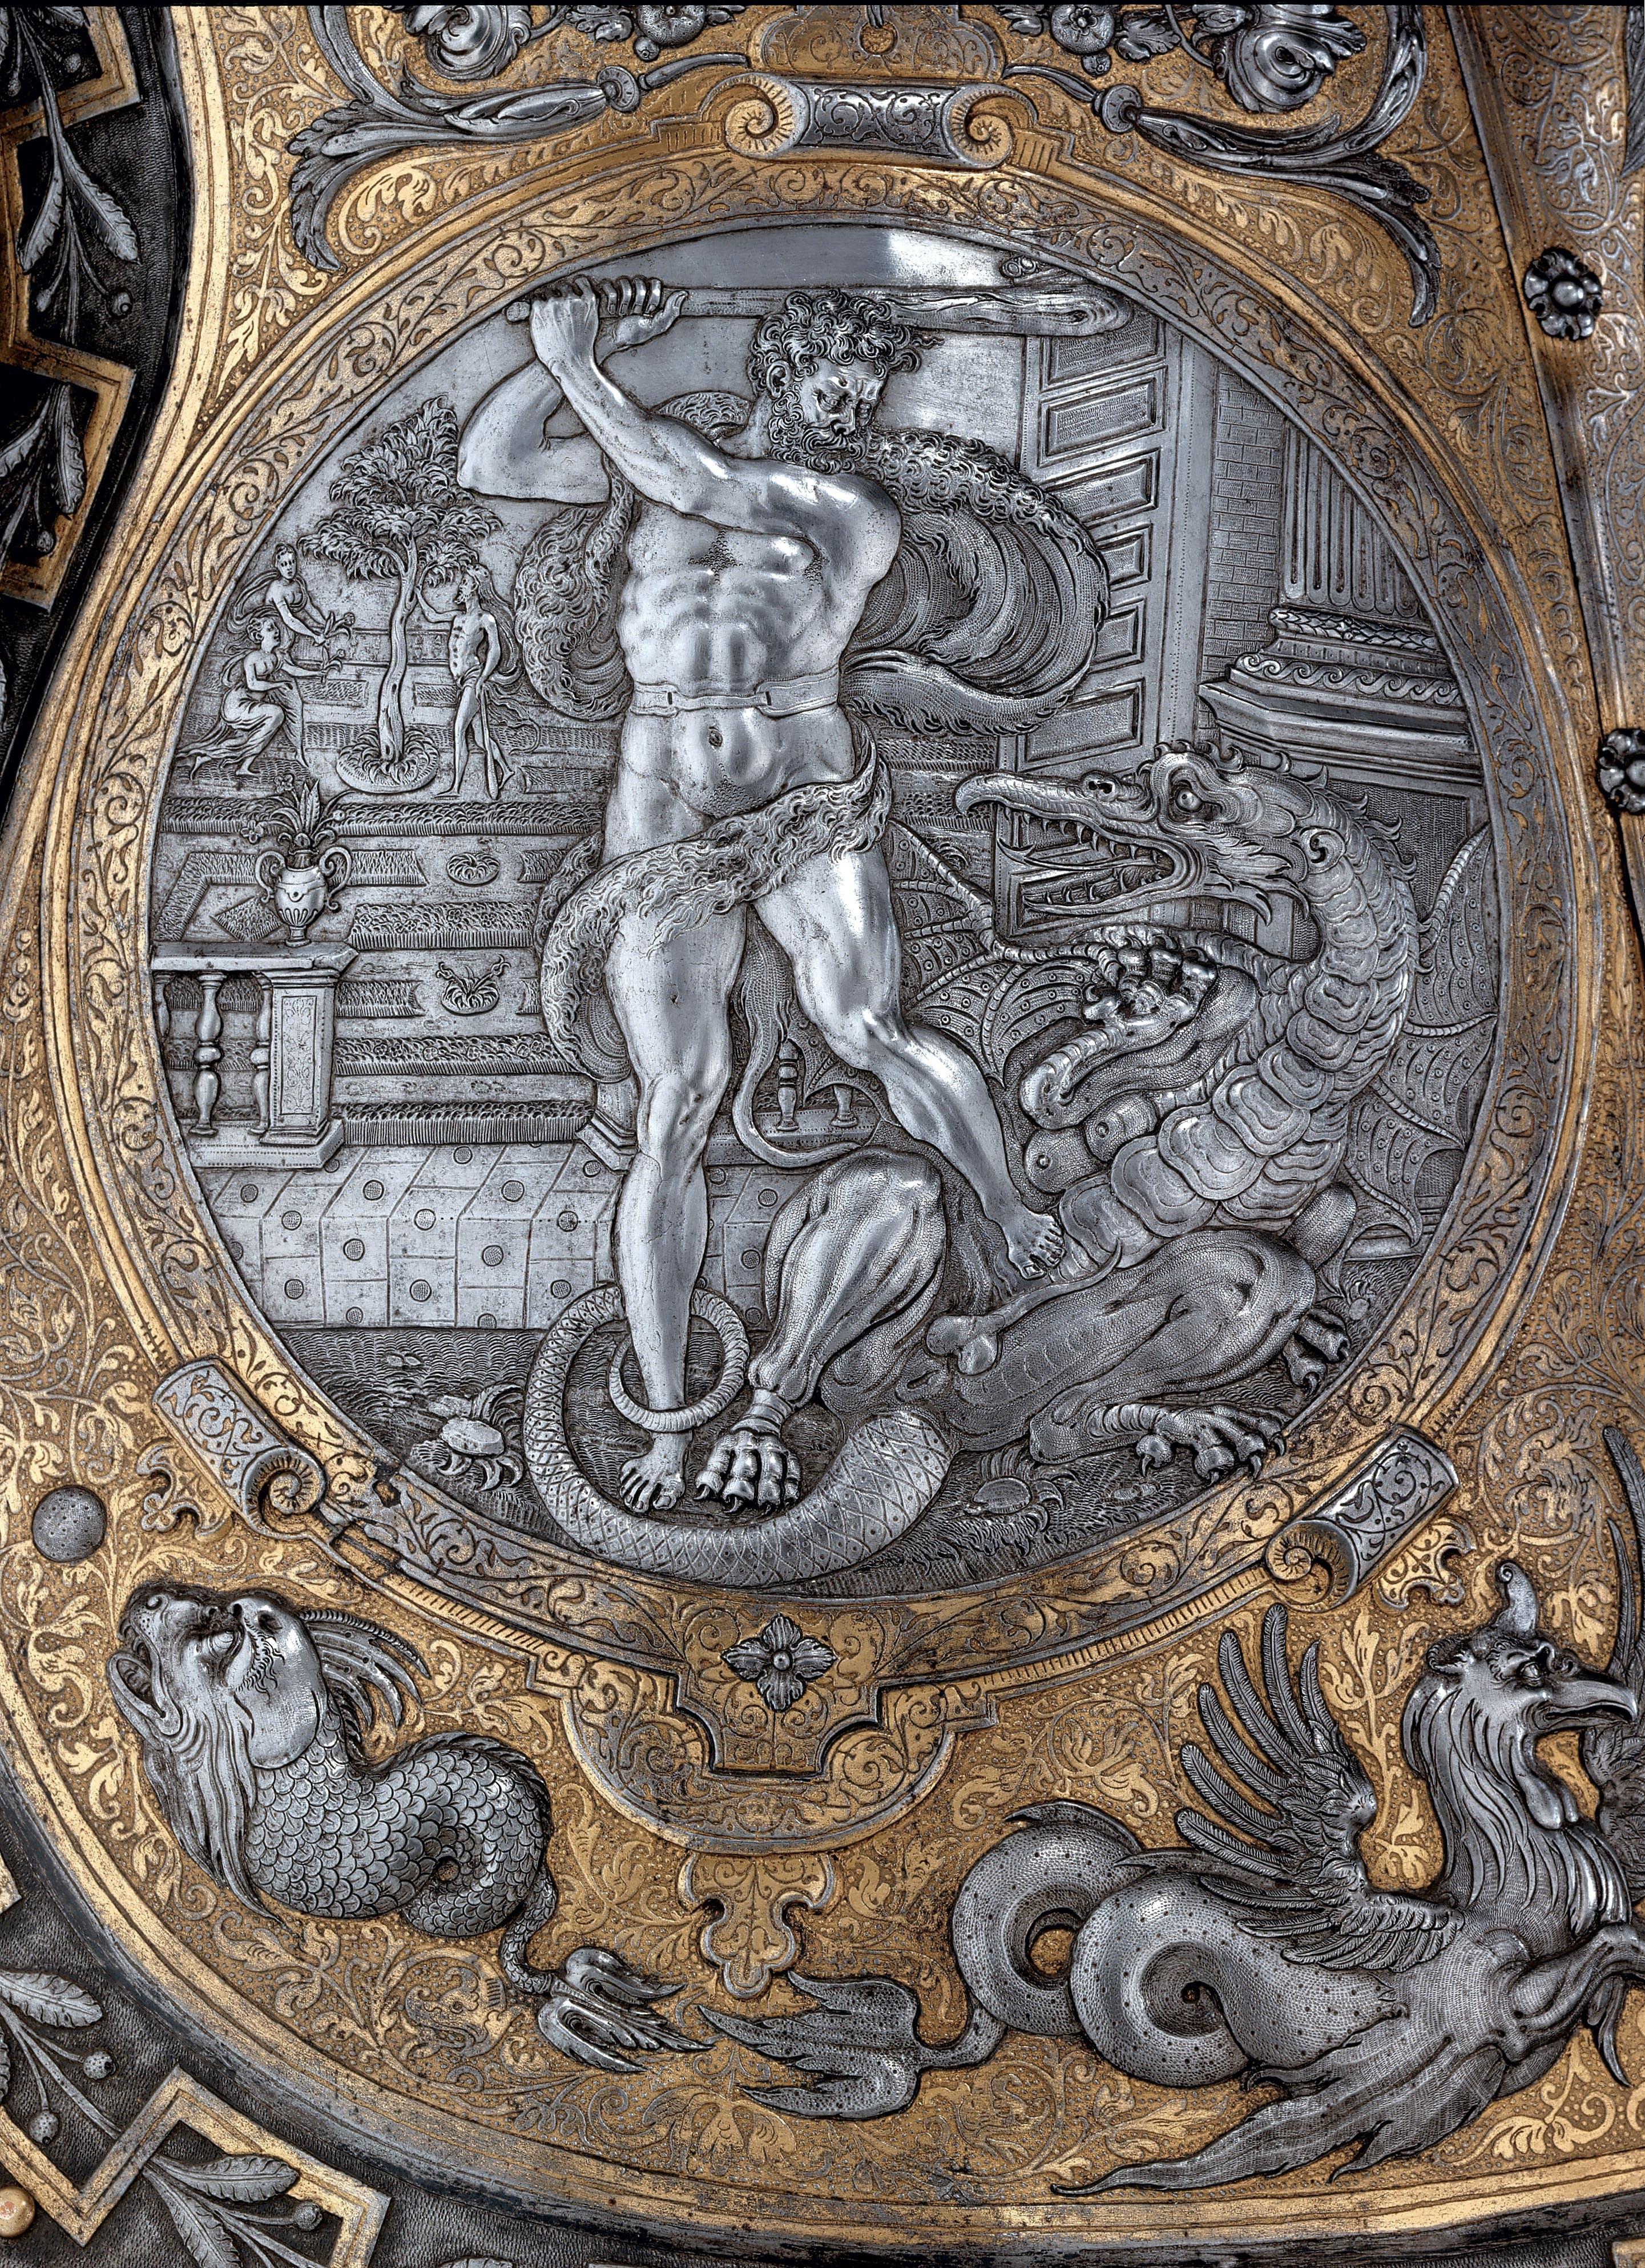 Armure d'Erik XIV de Suède